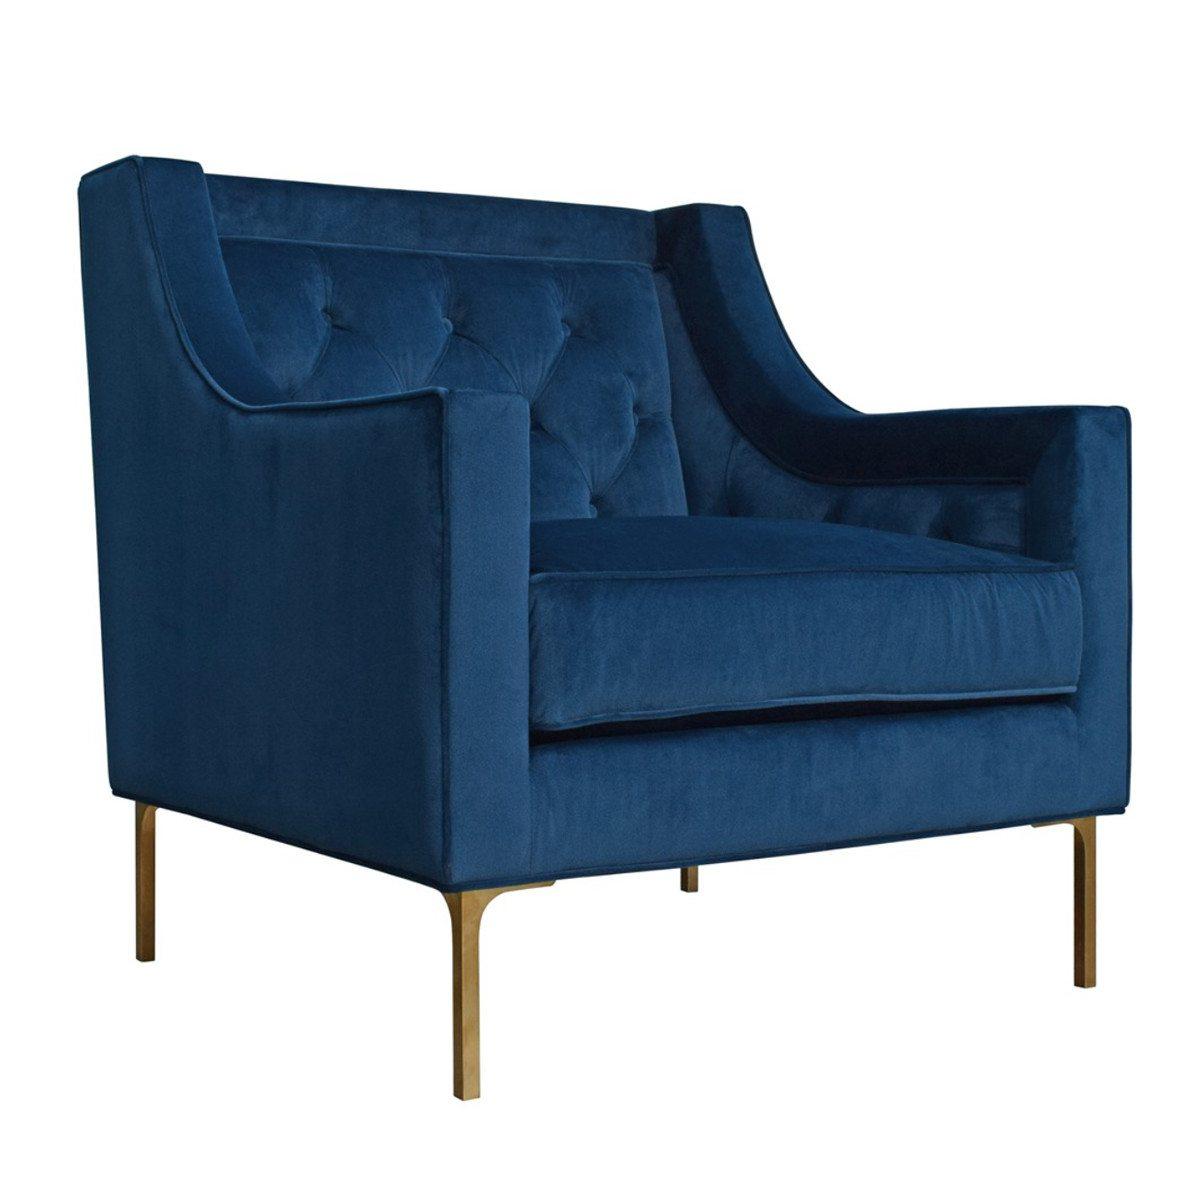 elara-club-chair-1-shopceladon